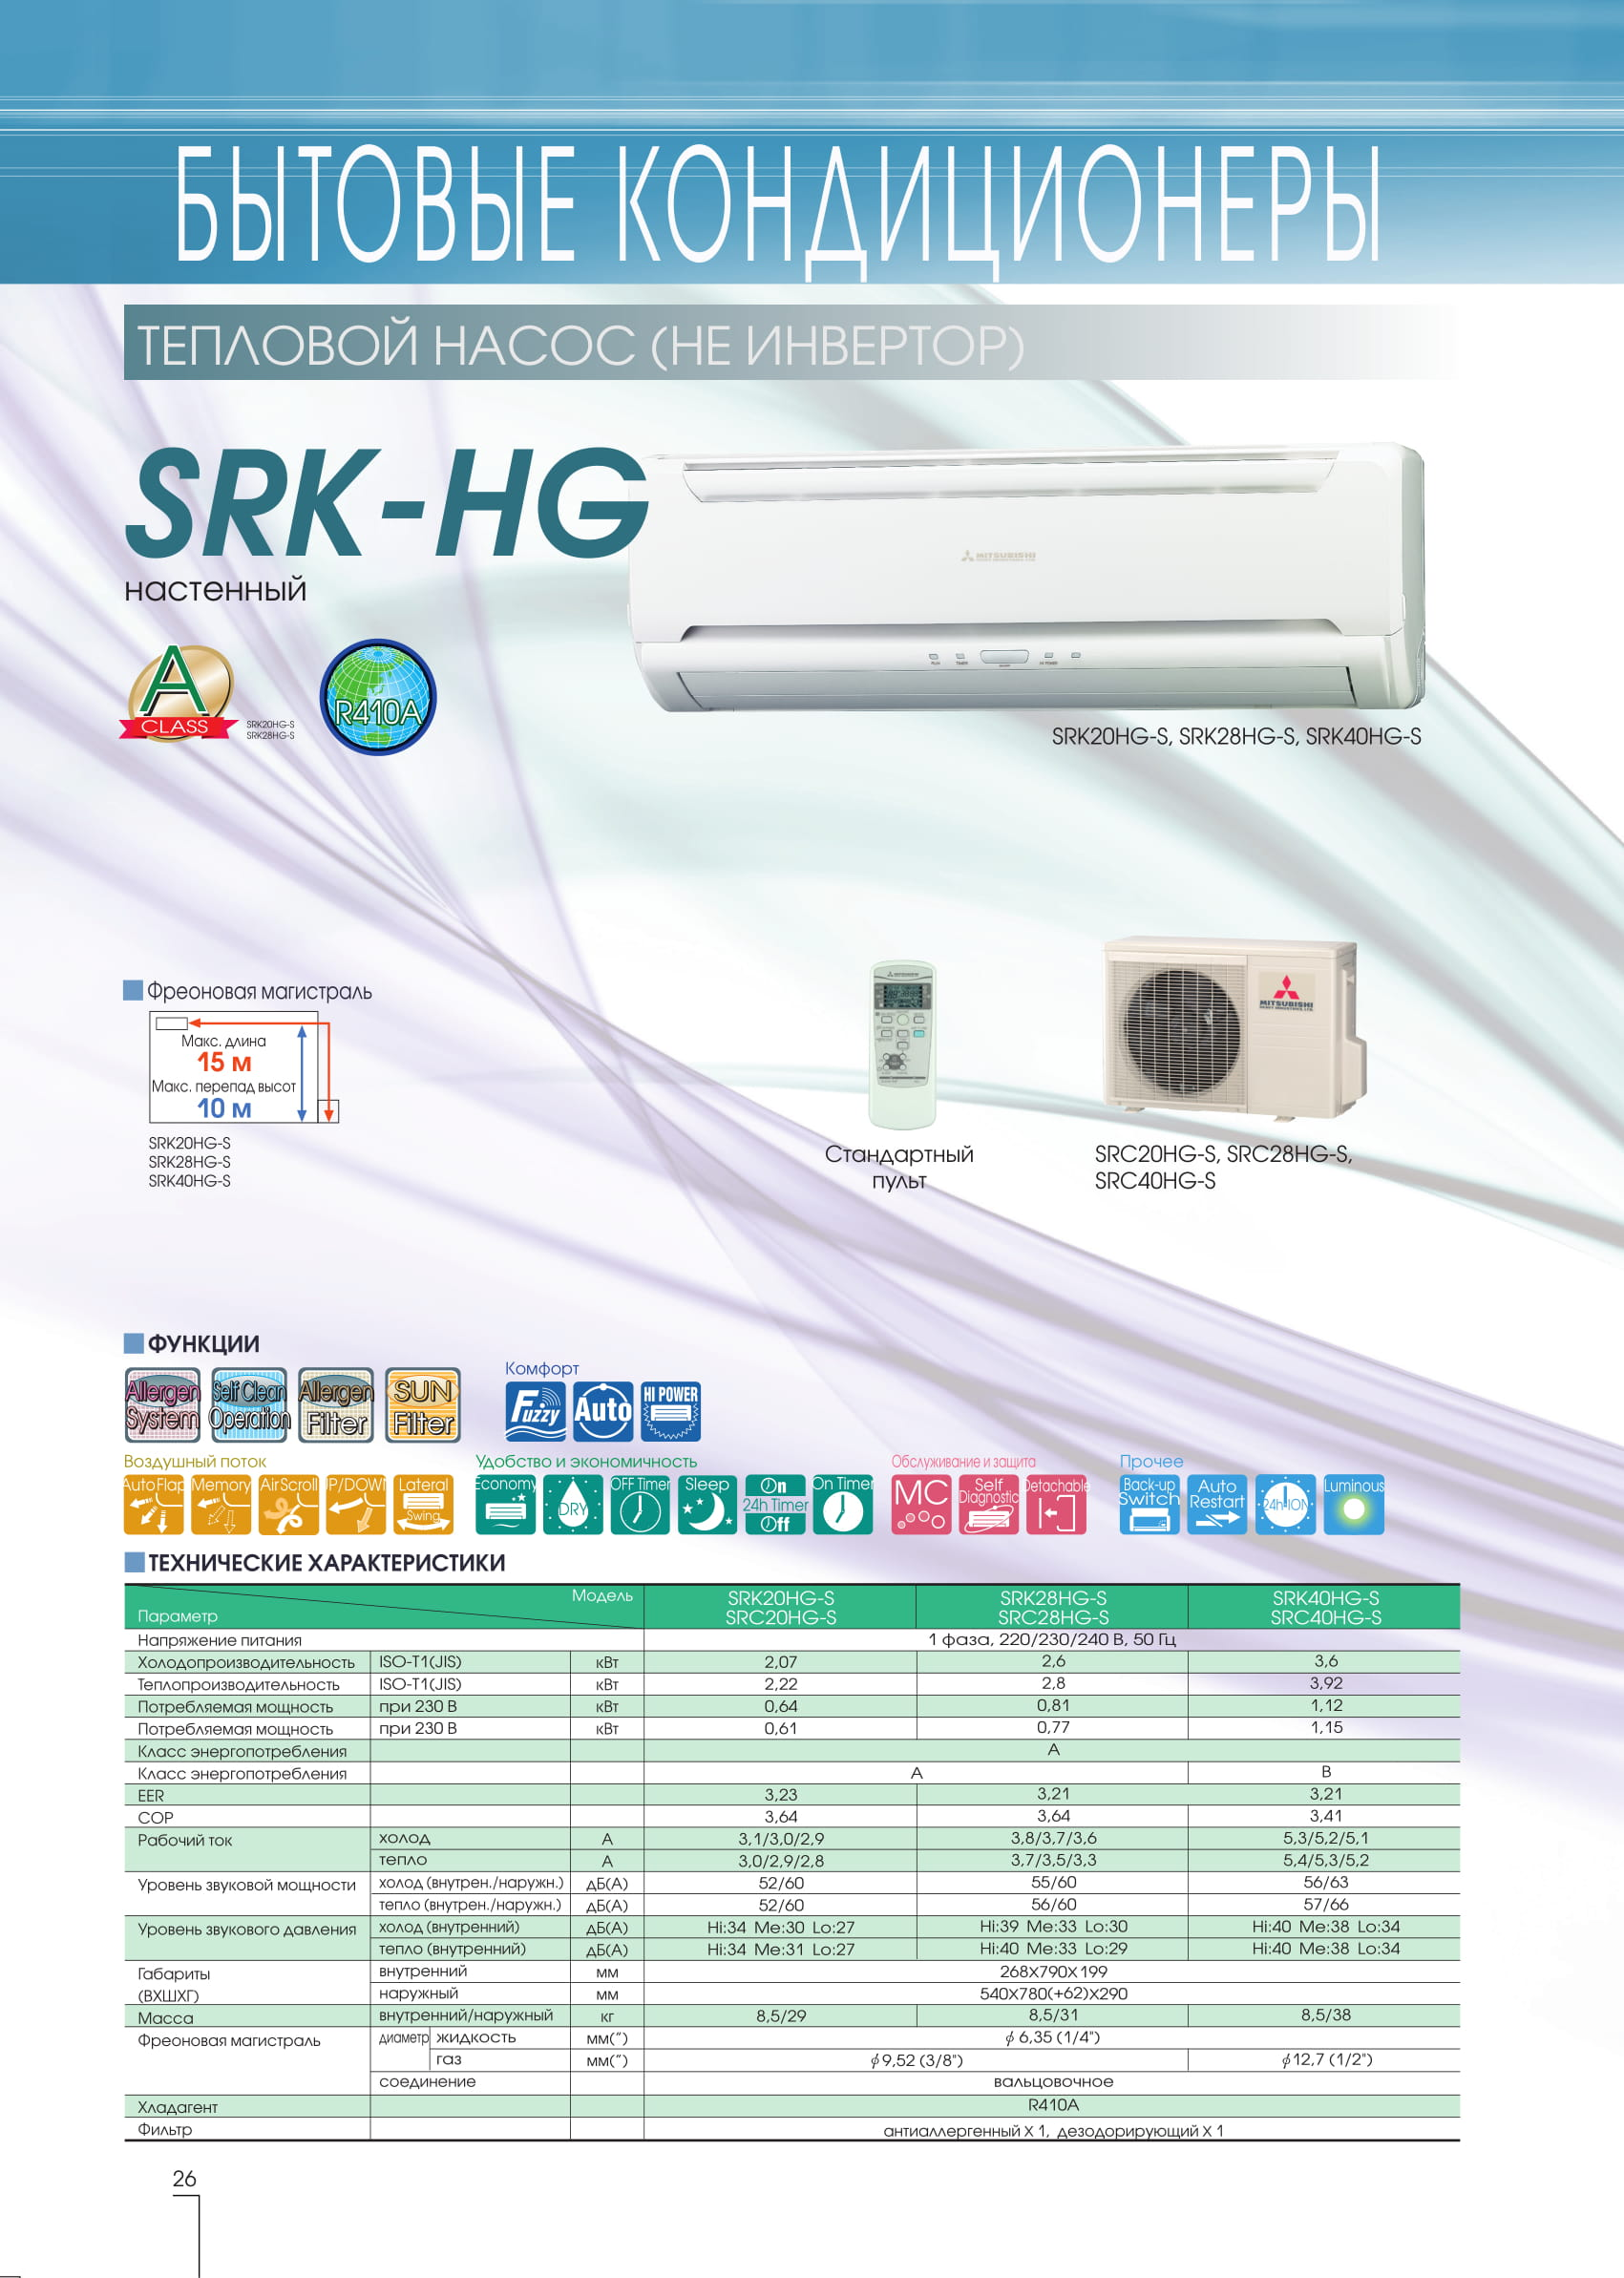 бытовая серия SRK HG-S Mitsubishi heavy